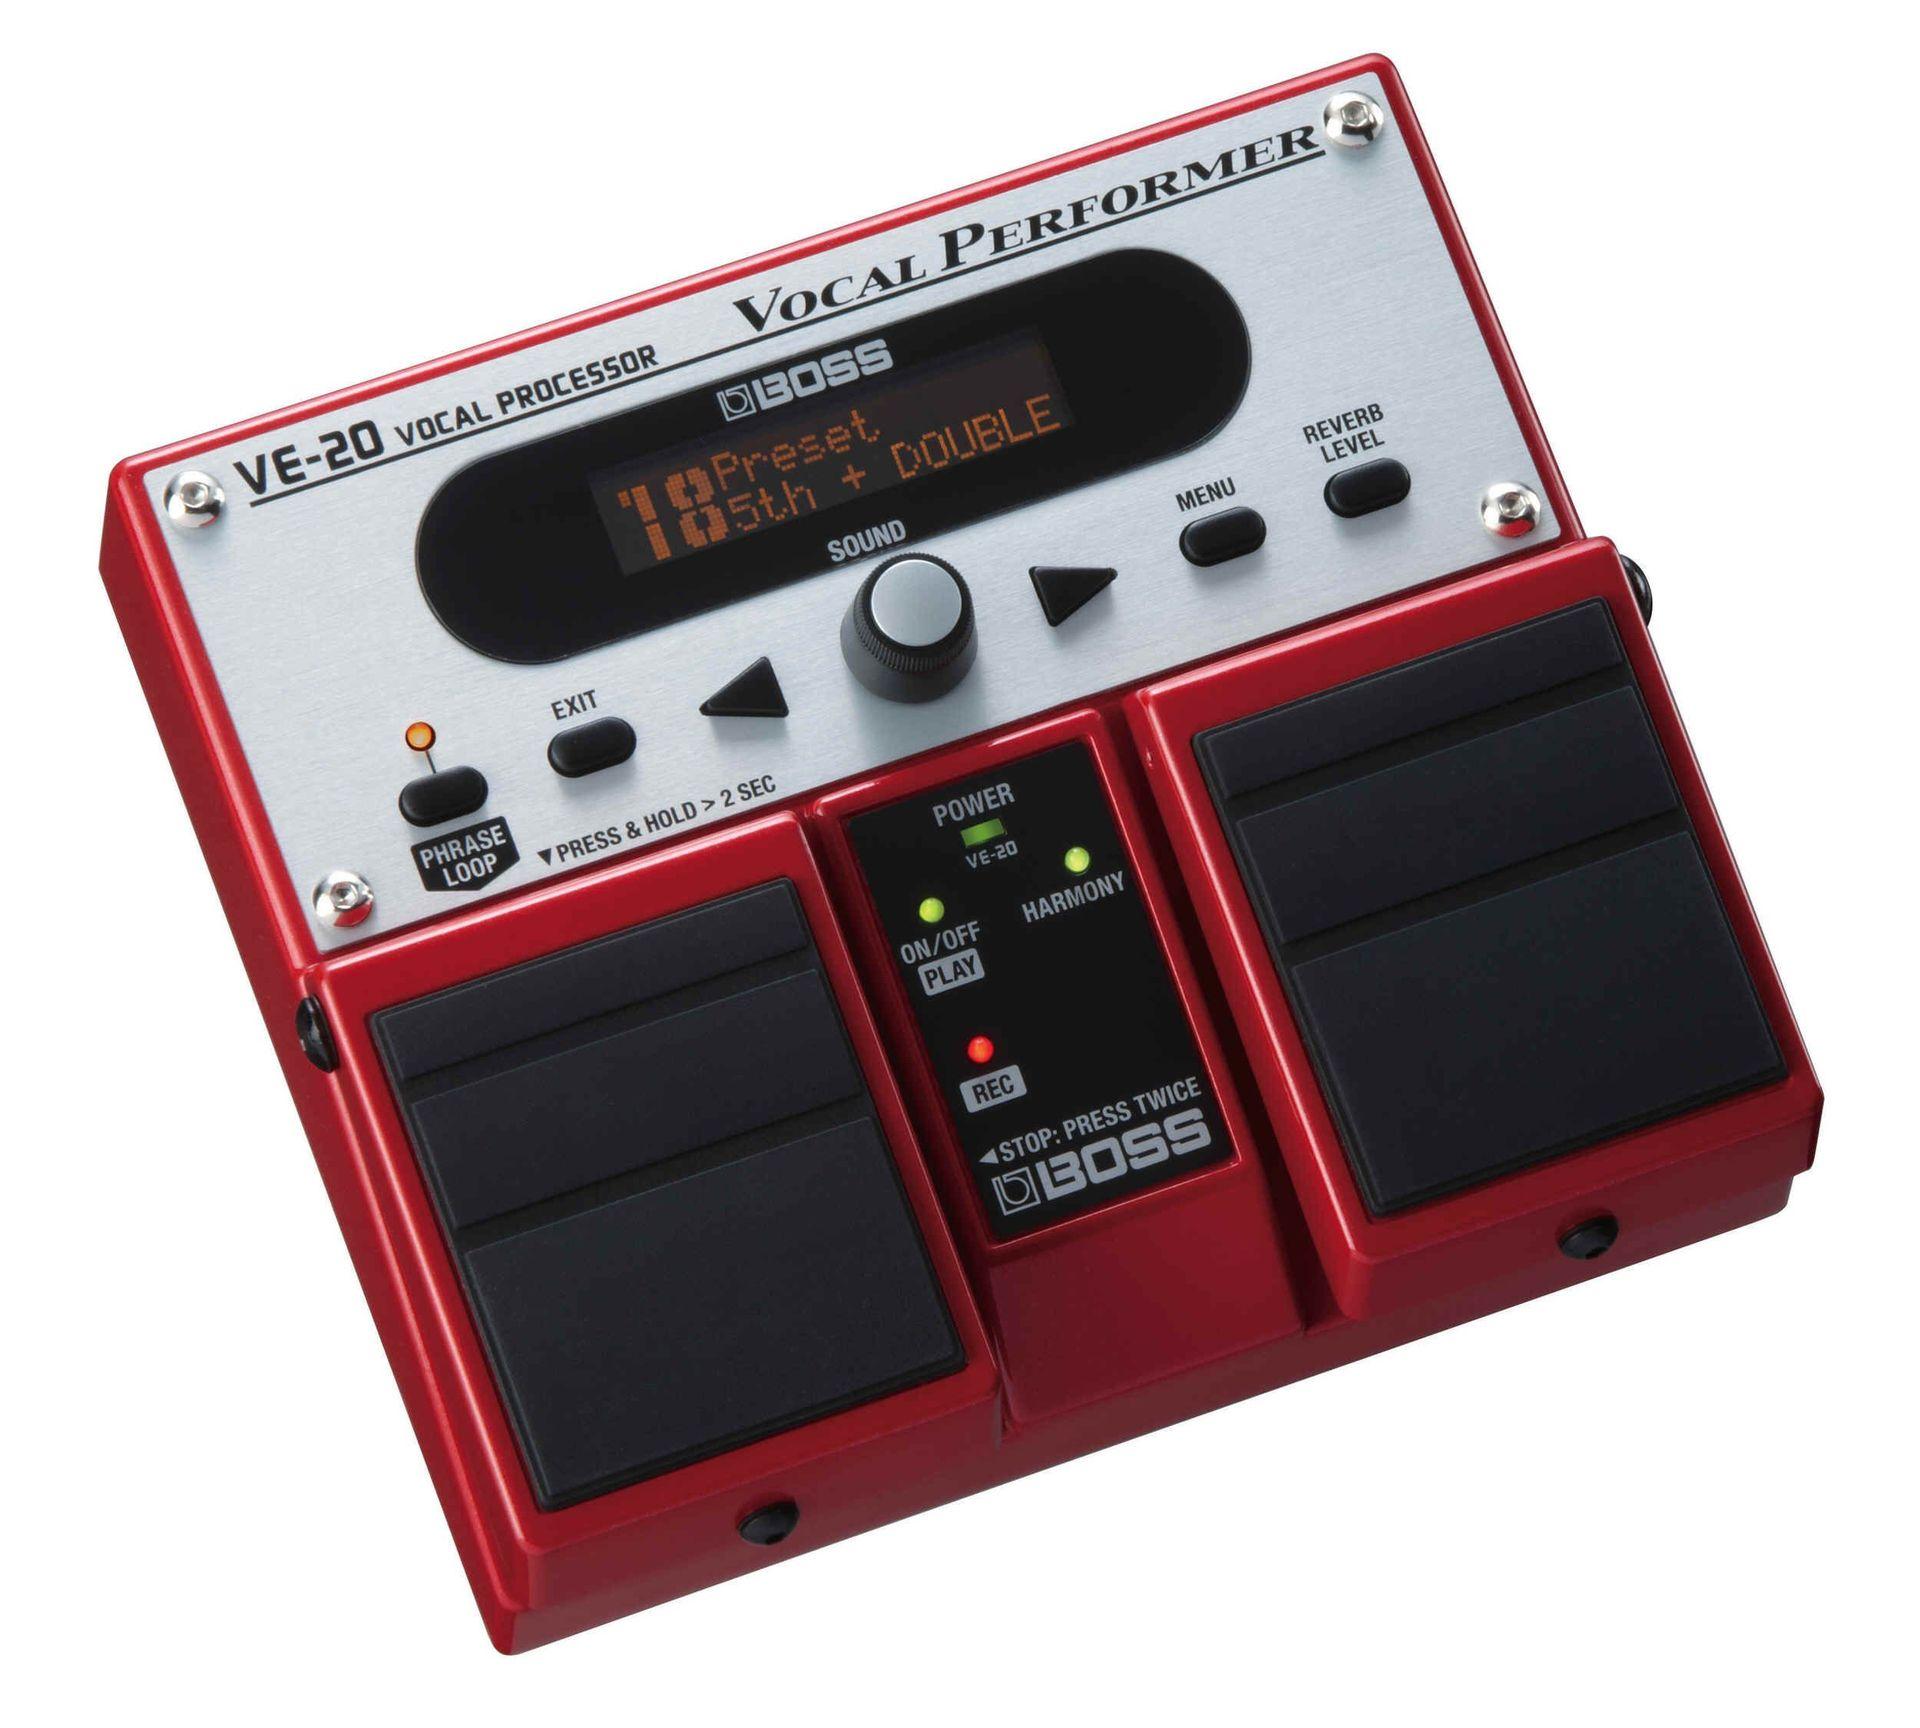 Boss VE-20 Effektgerät Vocal Performer, 2 stimmiger Harmonist